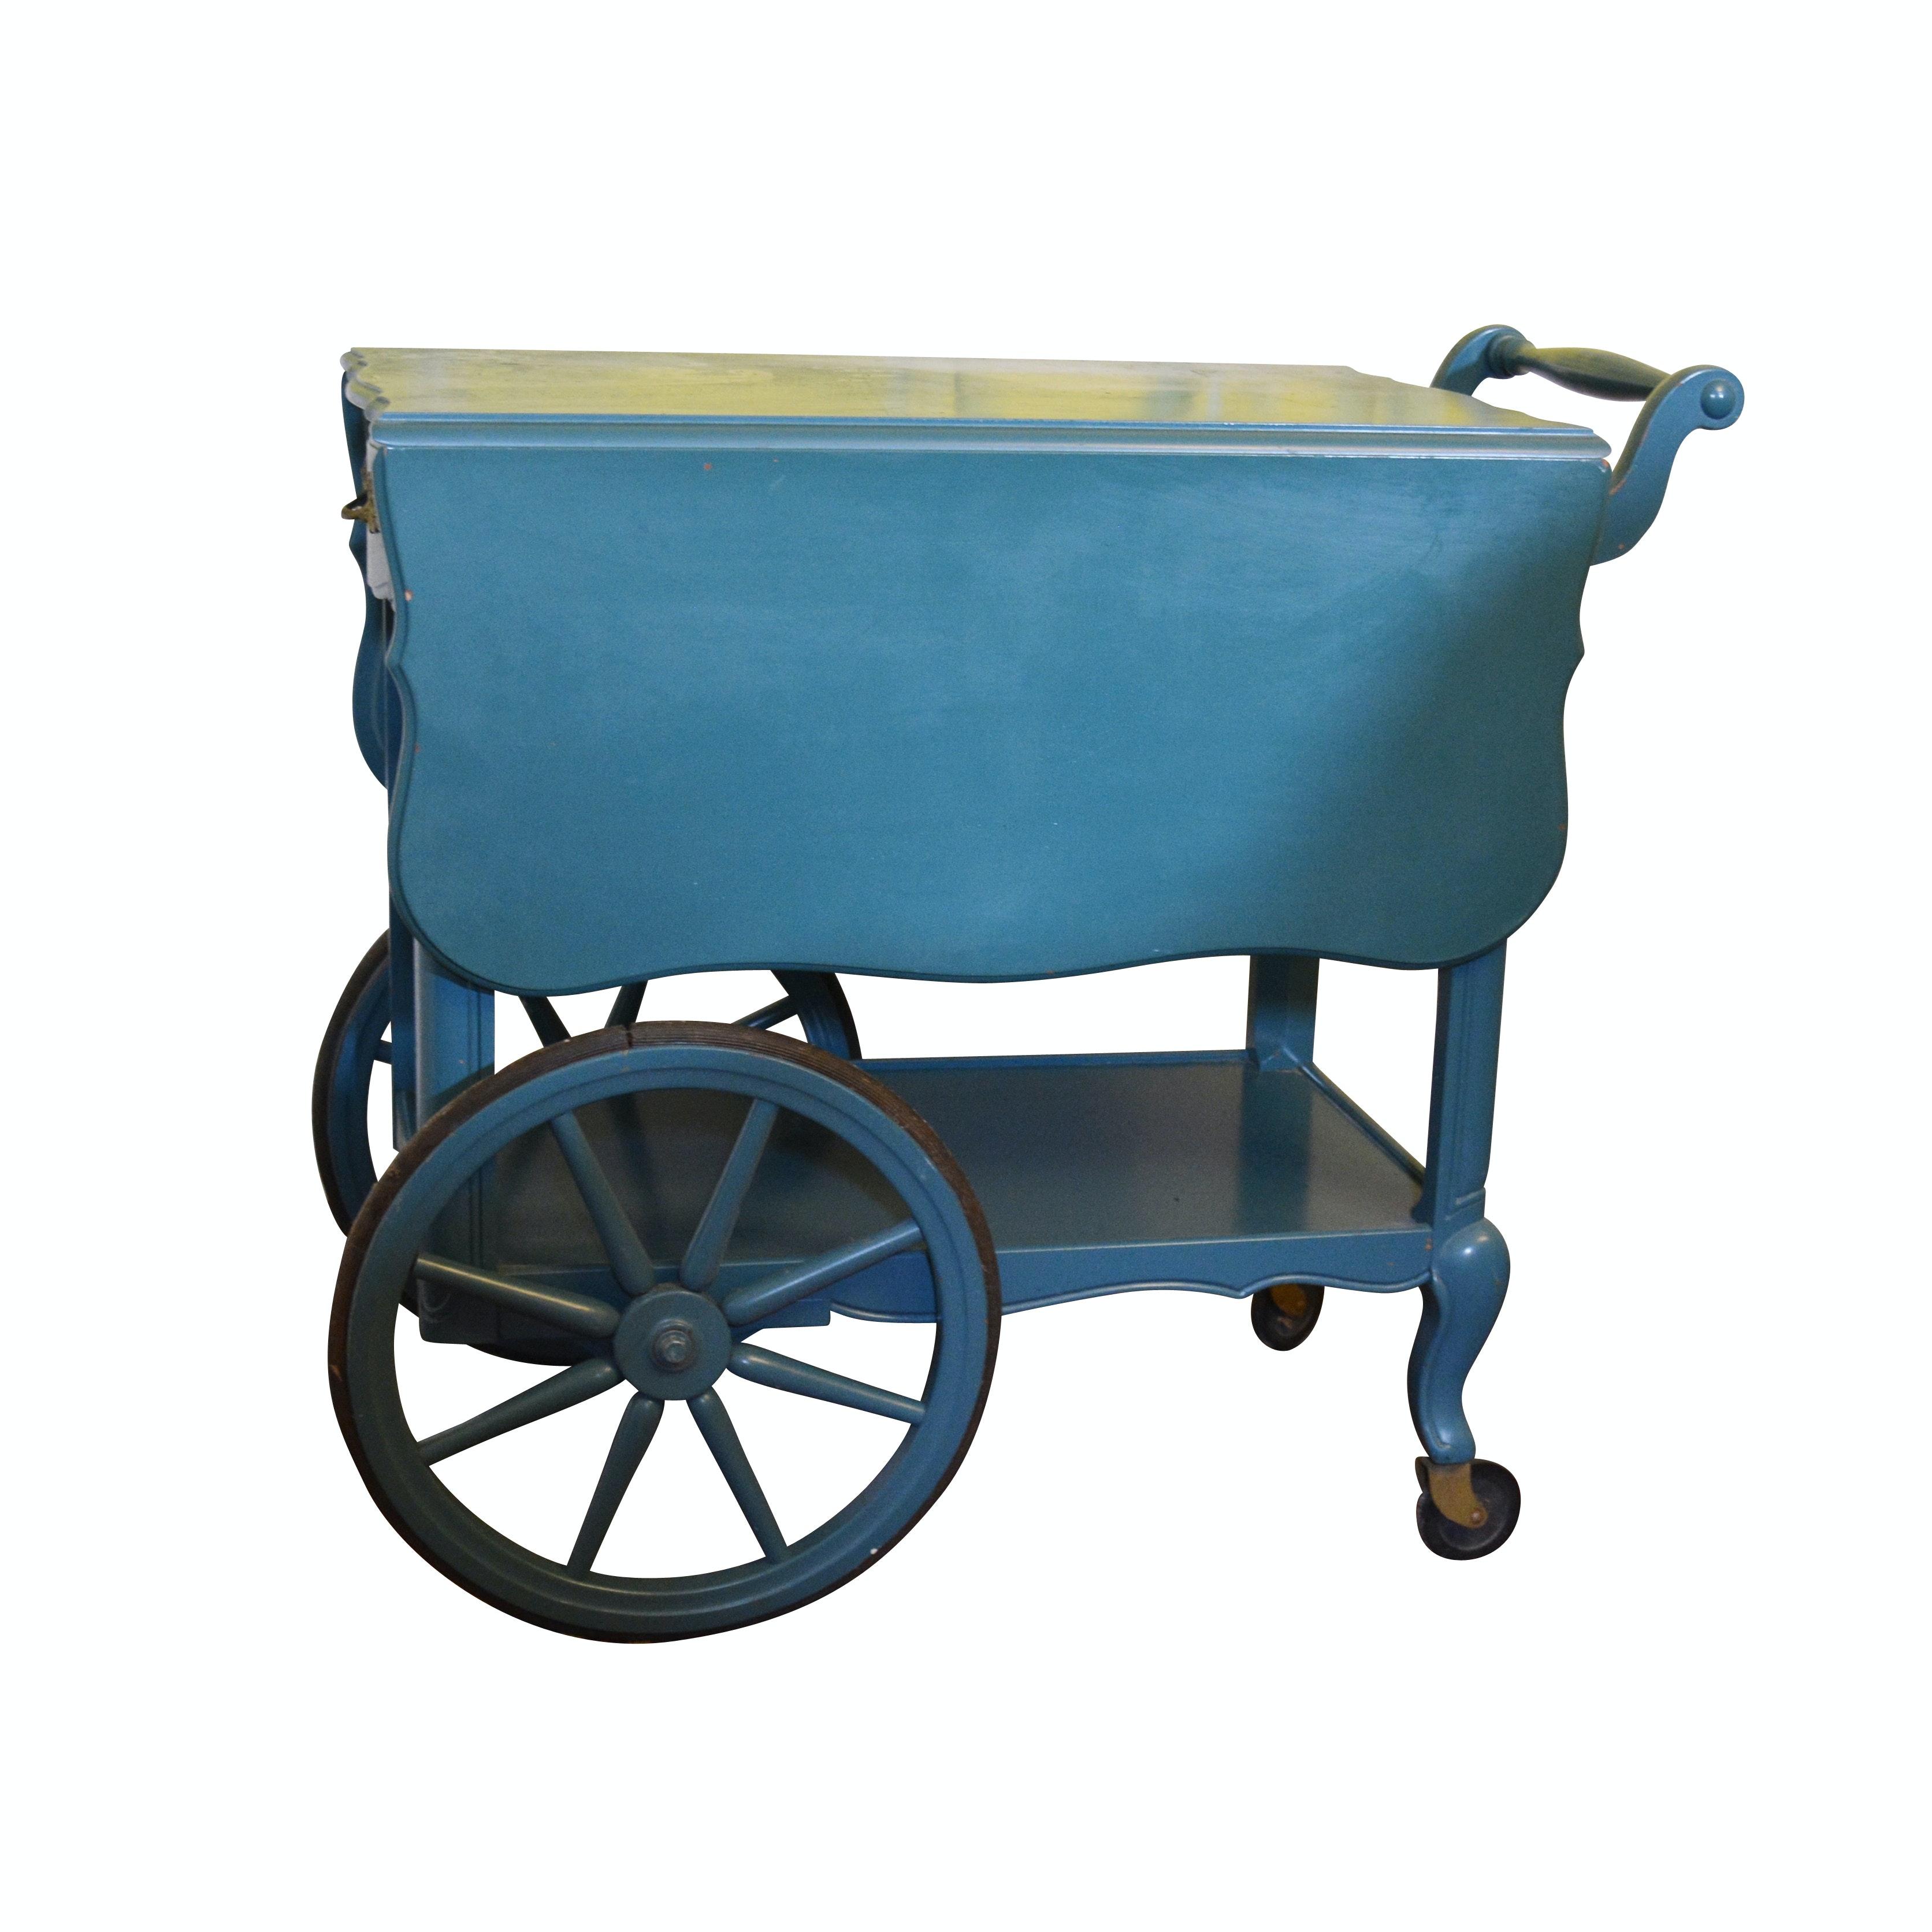 Painted Wood Drop Leaf Tea Cart, 20th Century